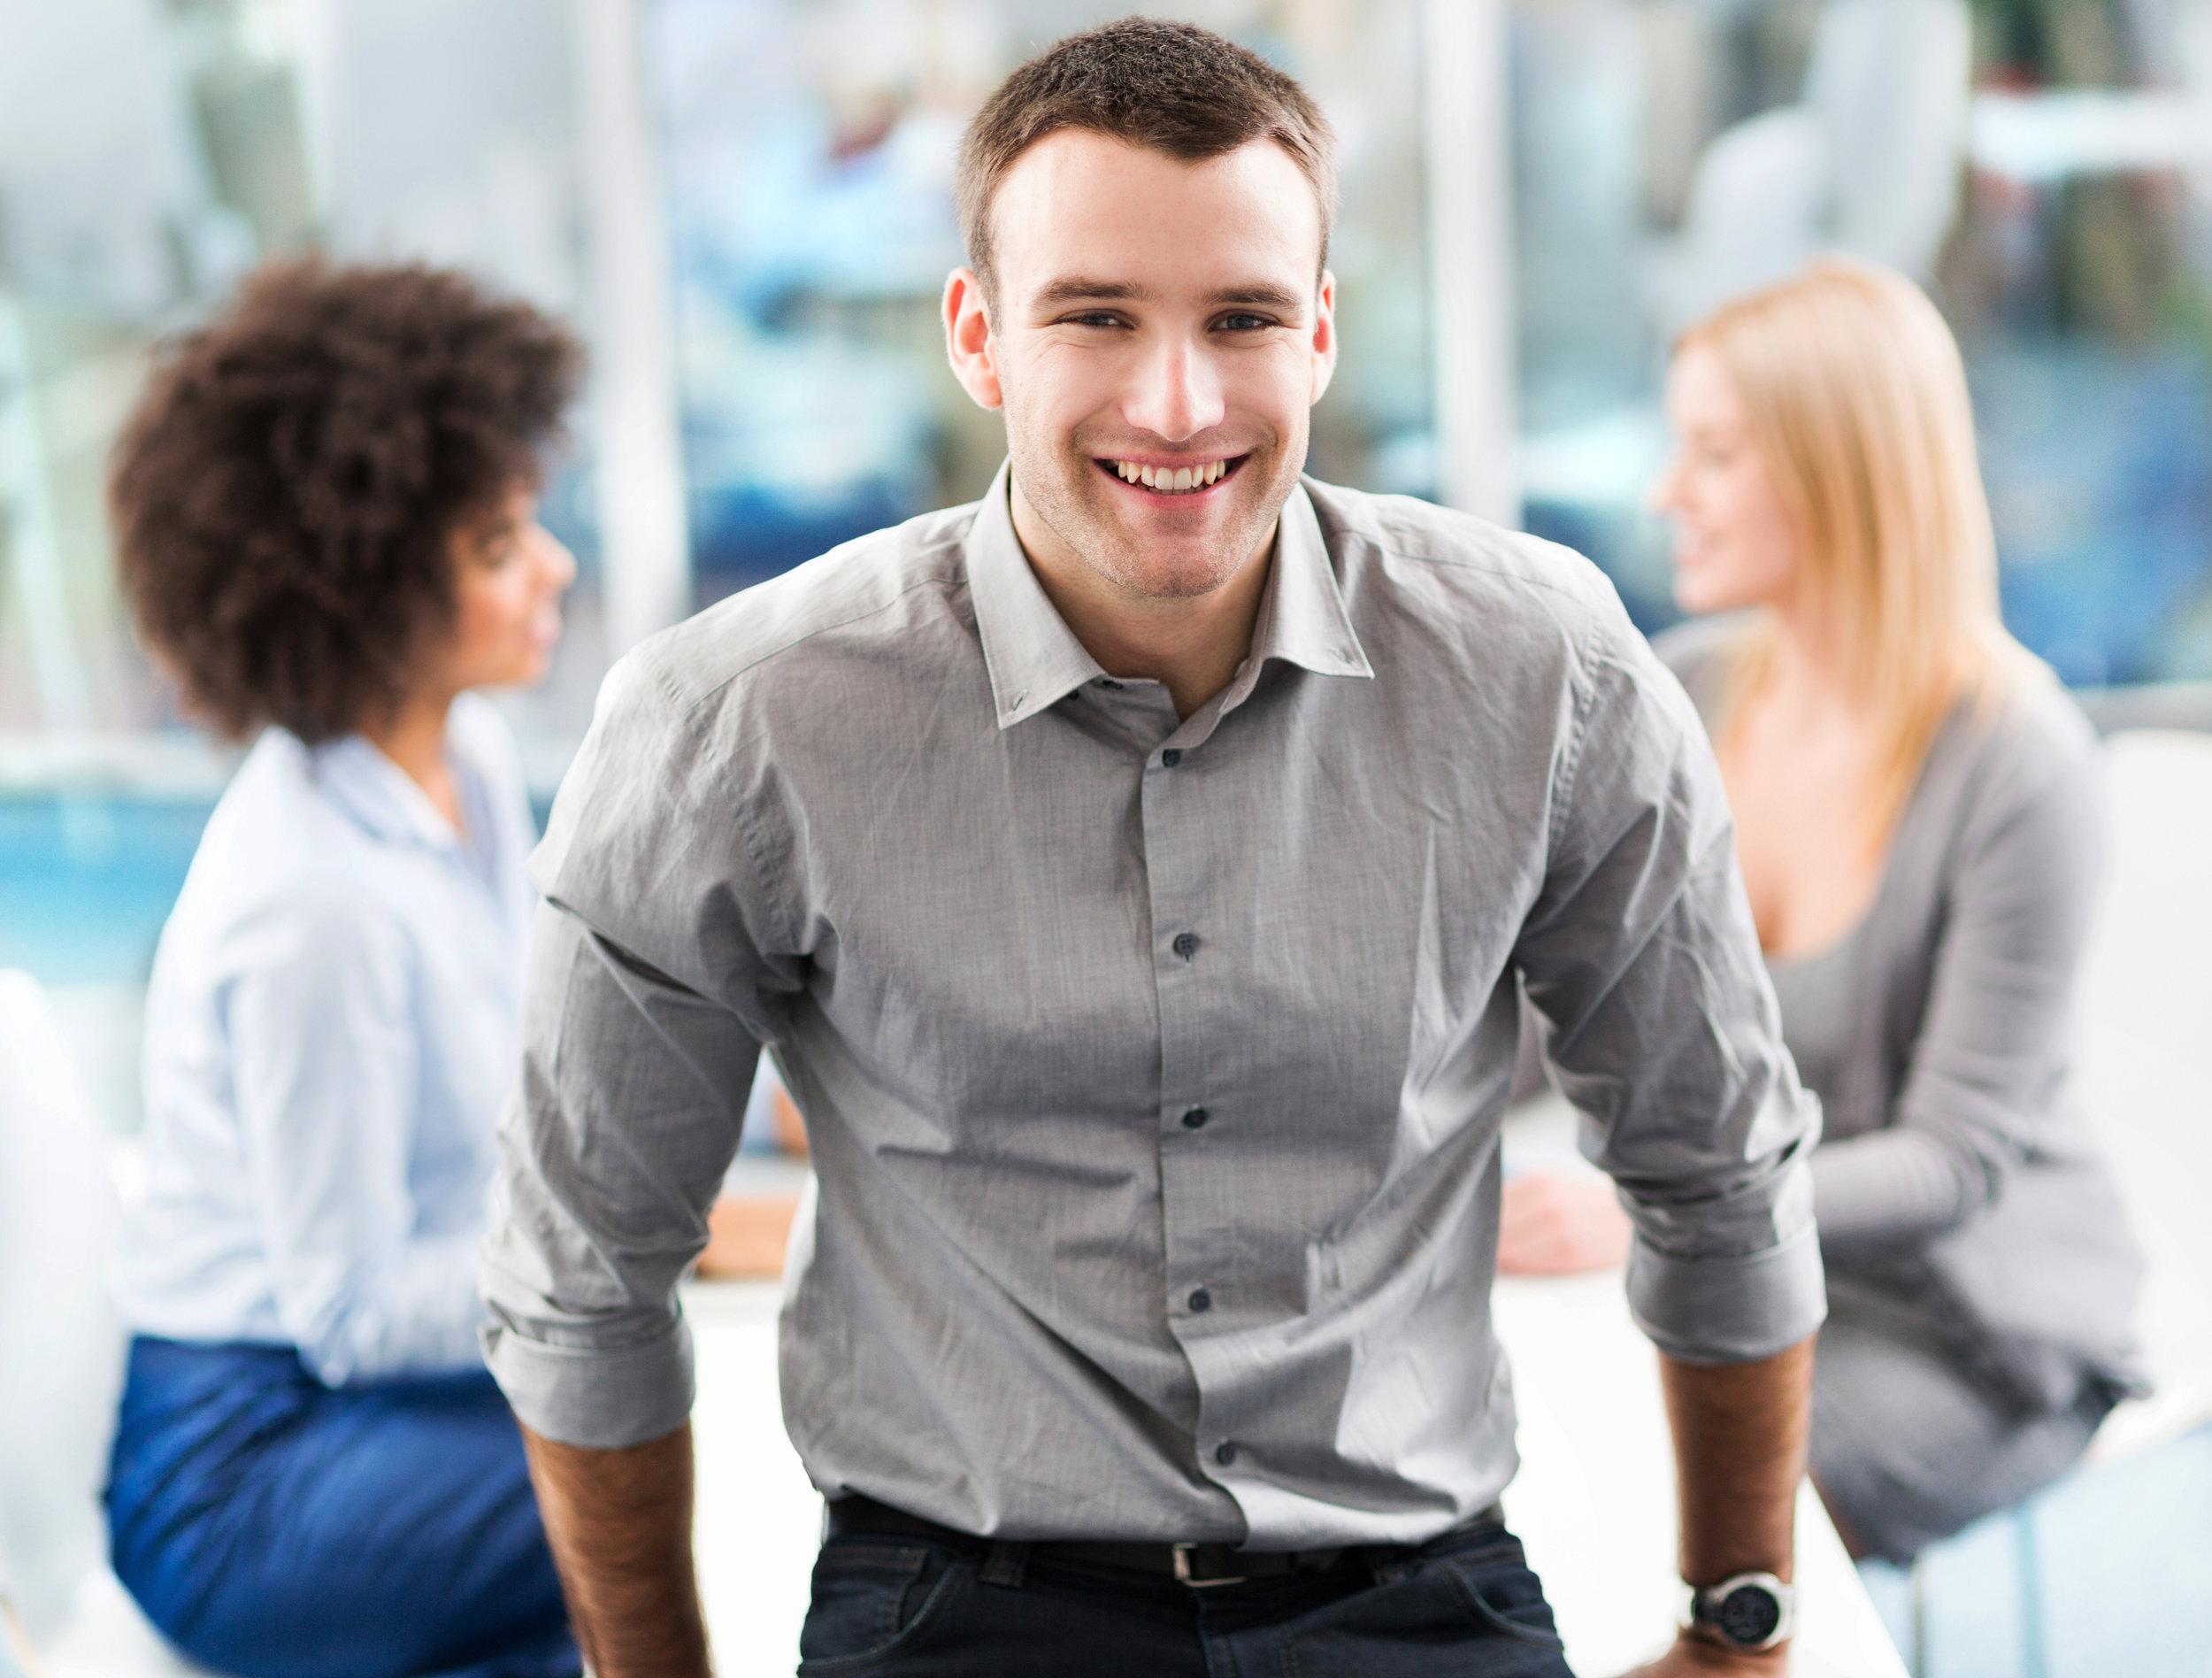 Businessman-with-his-team-498605260_3627x2750.jpeg